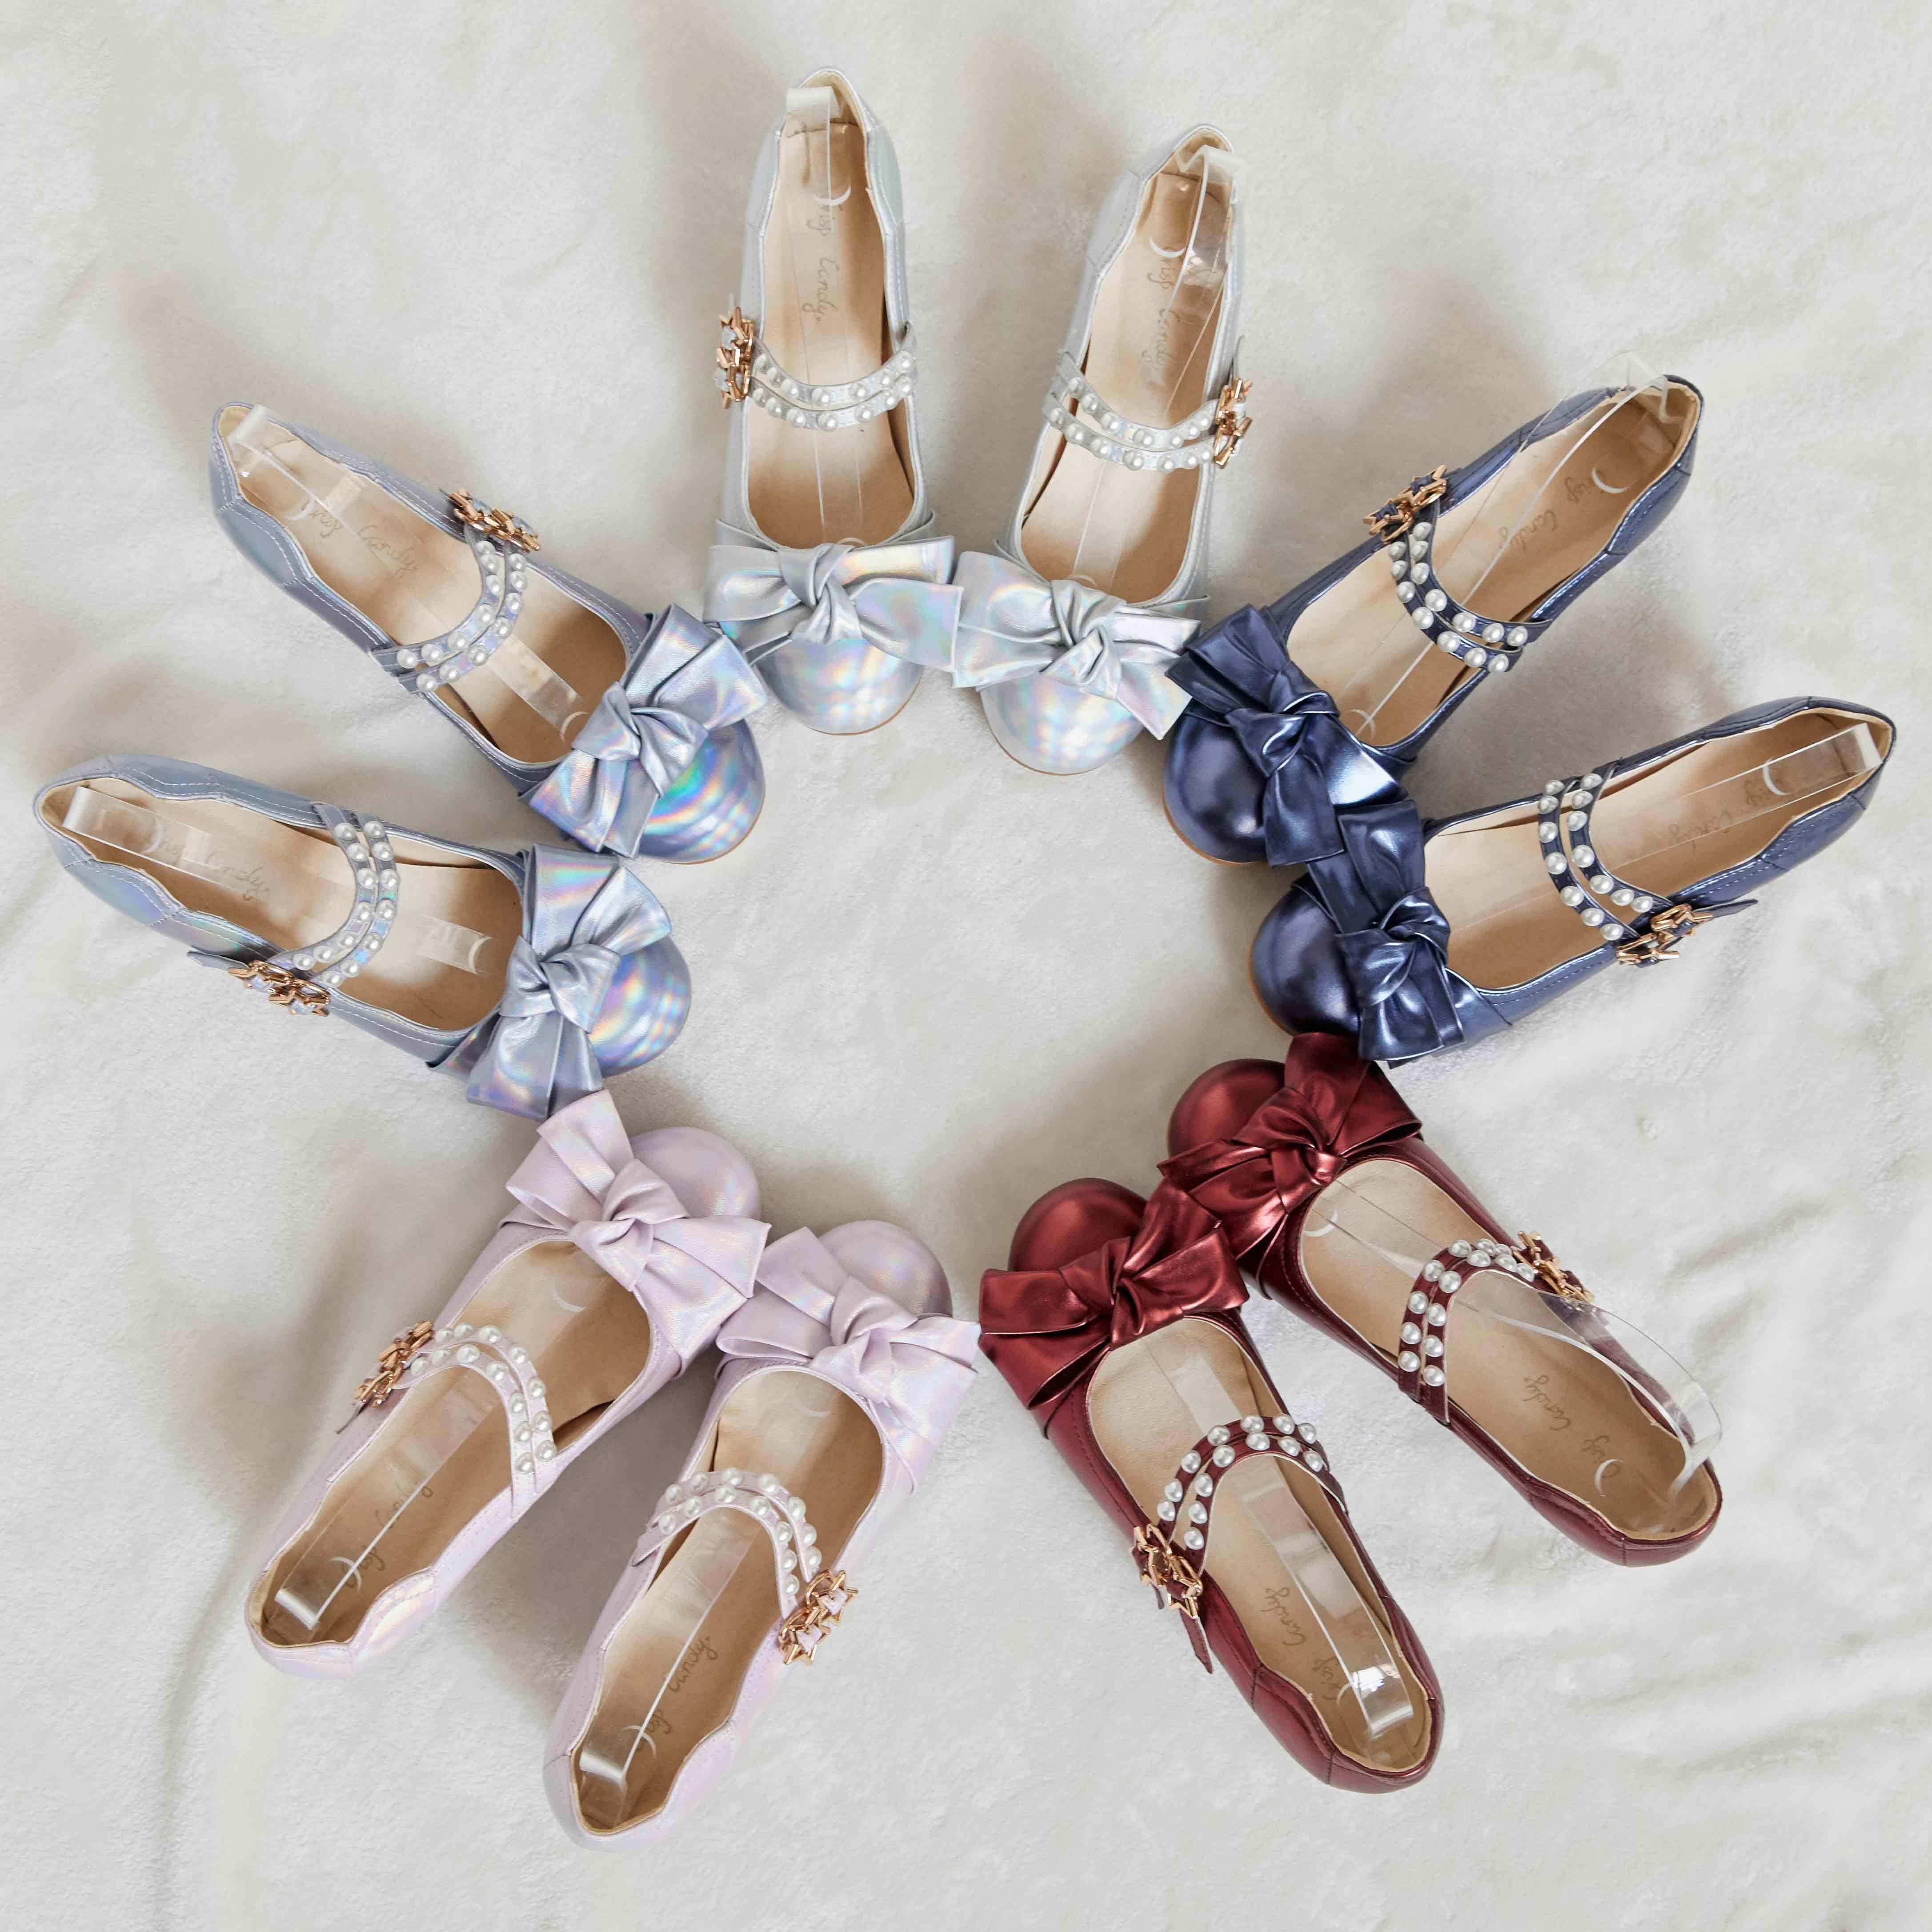 [C.C] [deposit] original Venus gemstone 2.0 sweet Lolita laser pearlescent women's shoes